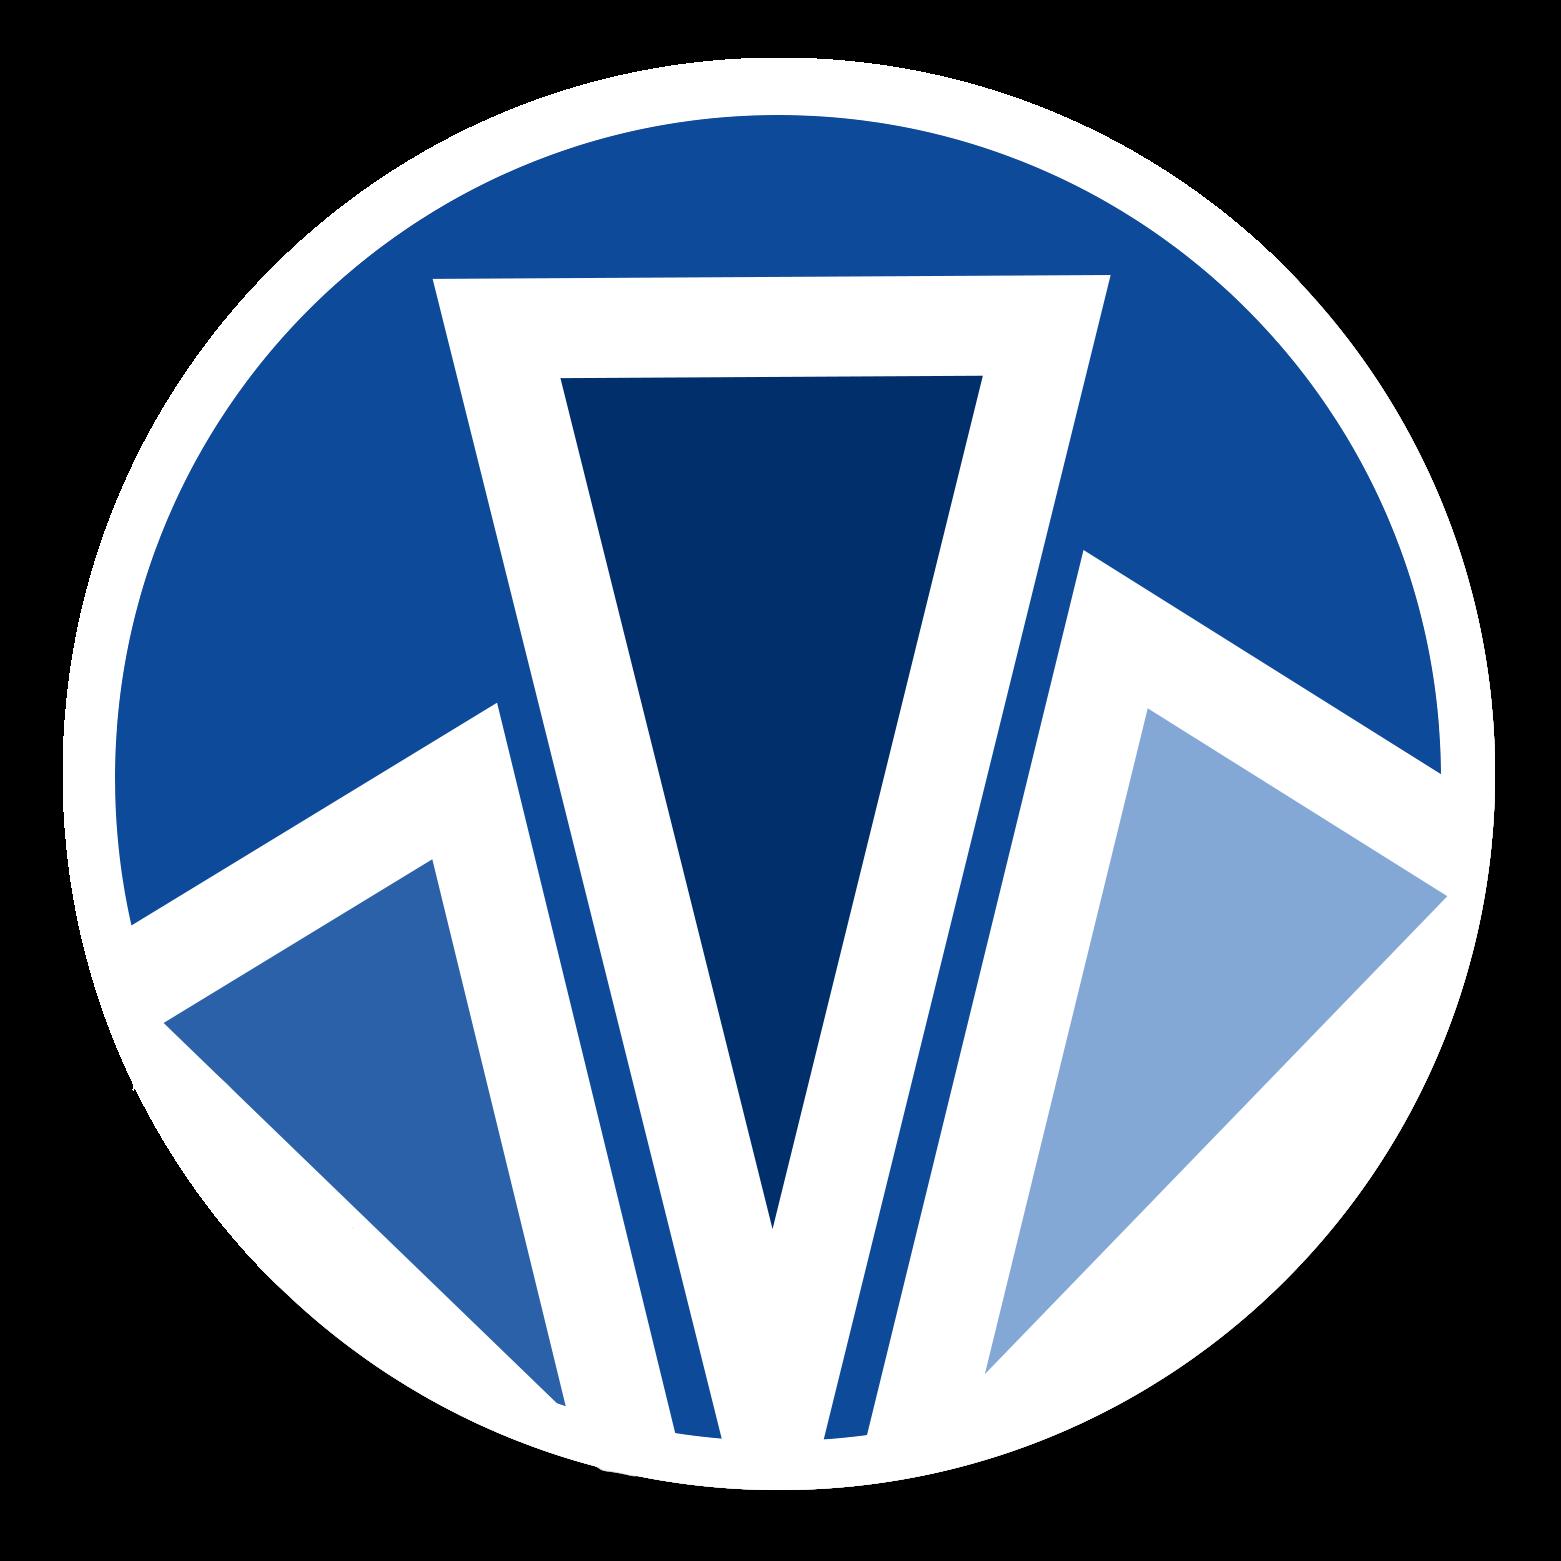 logo1 profile pic high res